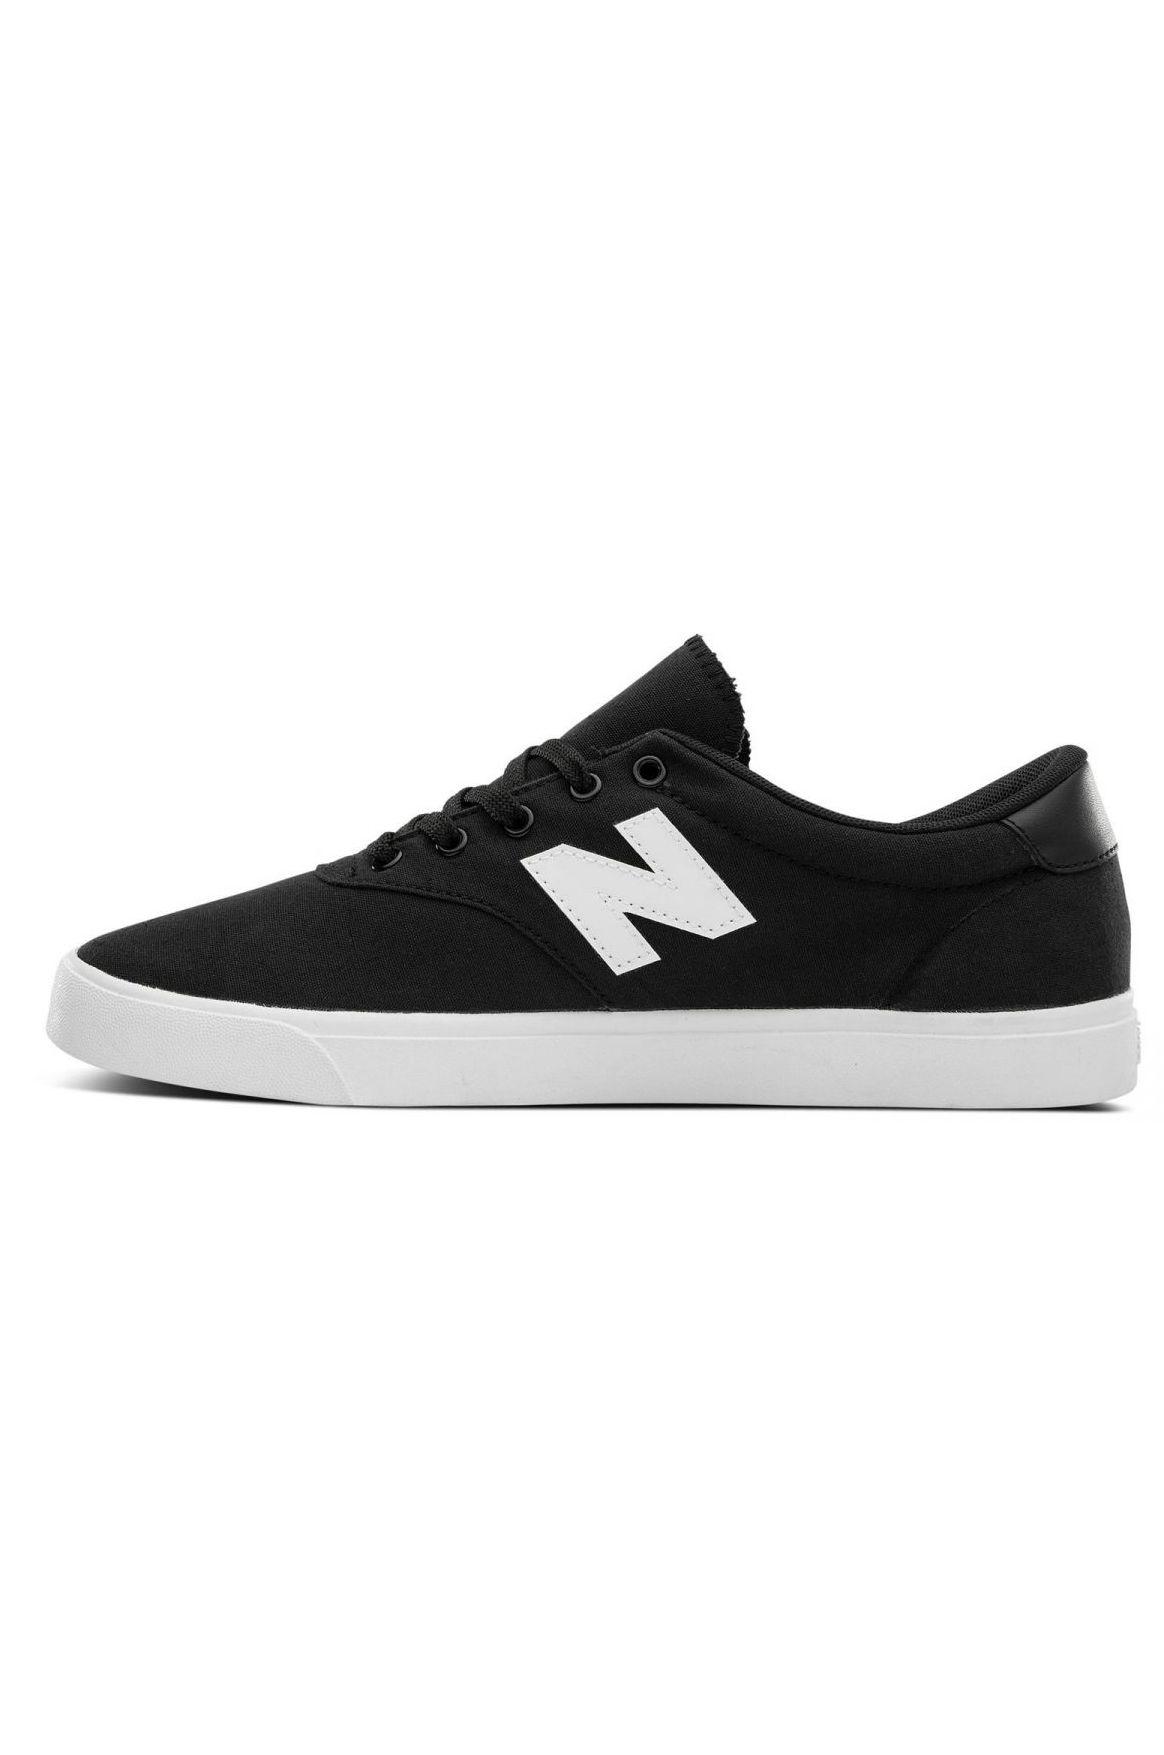 Tenis New Balance AM55 Black